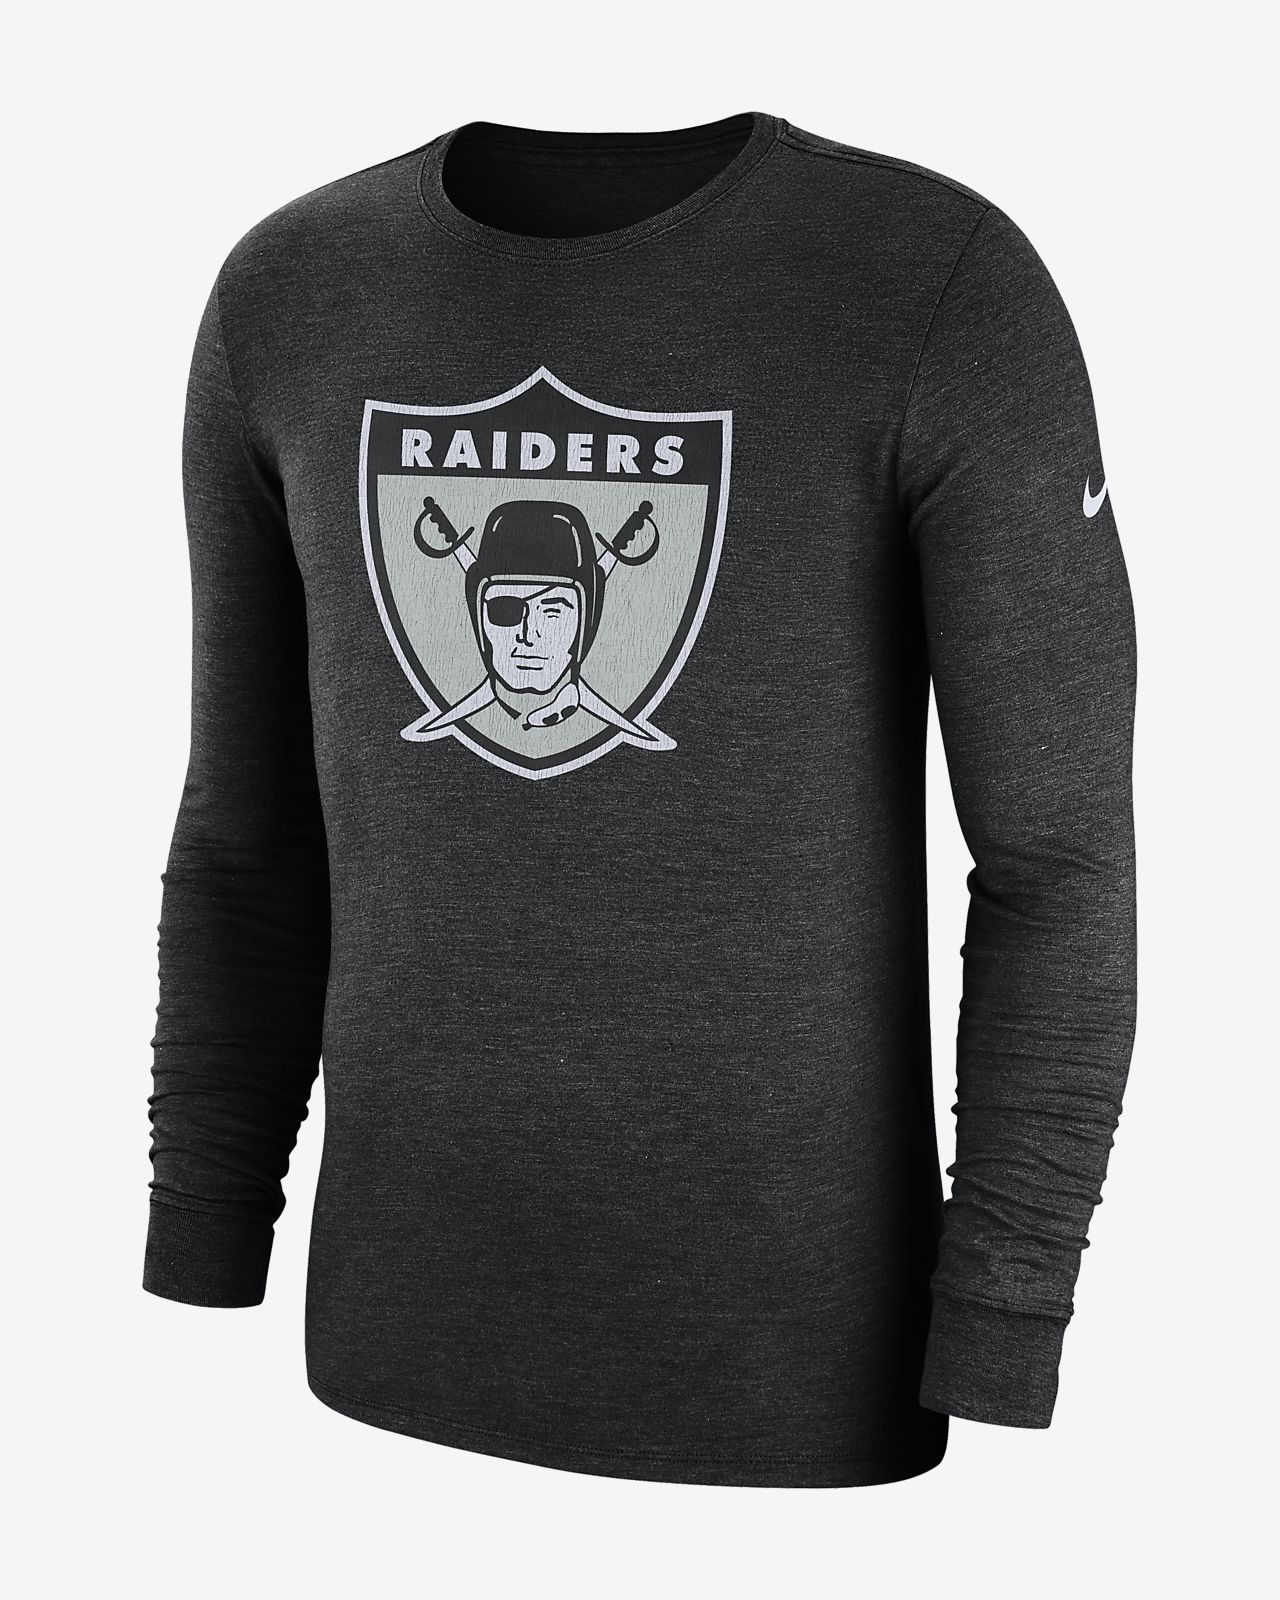 0a28522dccf43 ... Playera Tri-Blend de manga larga para hombre Nike (NFL Raiders)